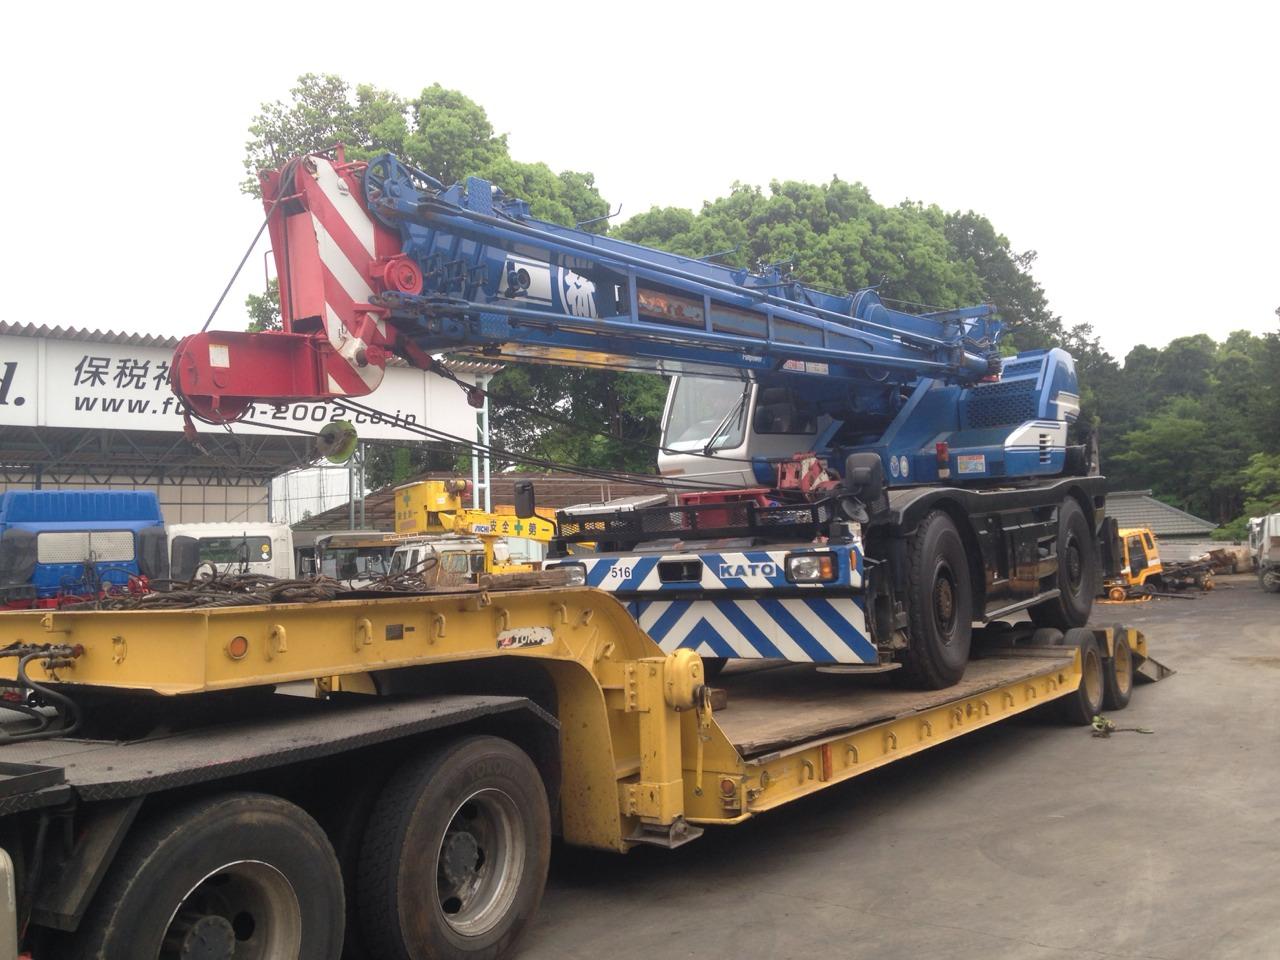 Rough Terrain Crane Malaysia : Ro fusion co ltd